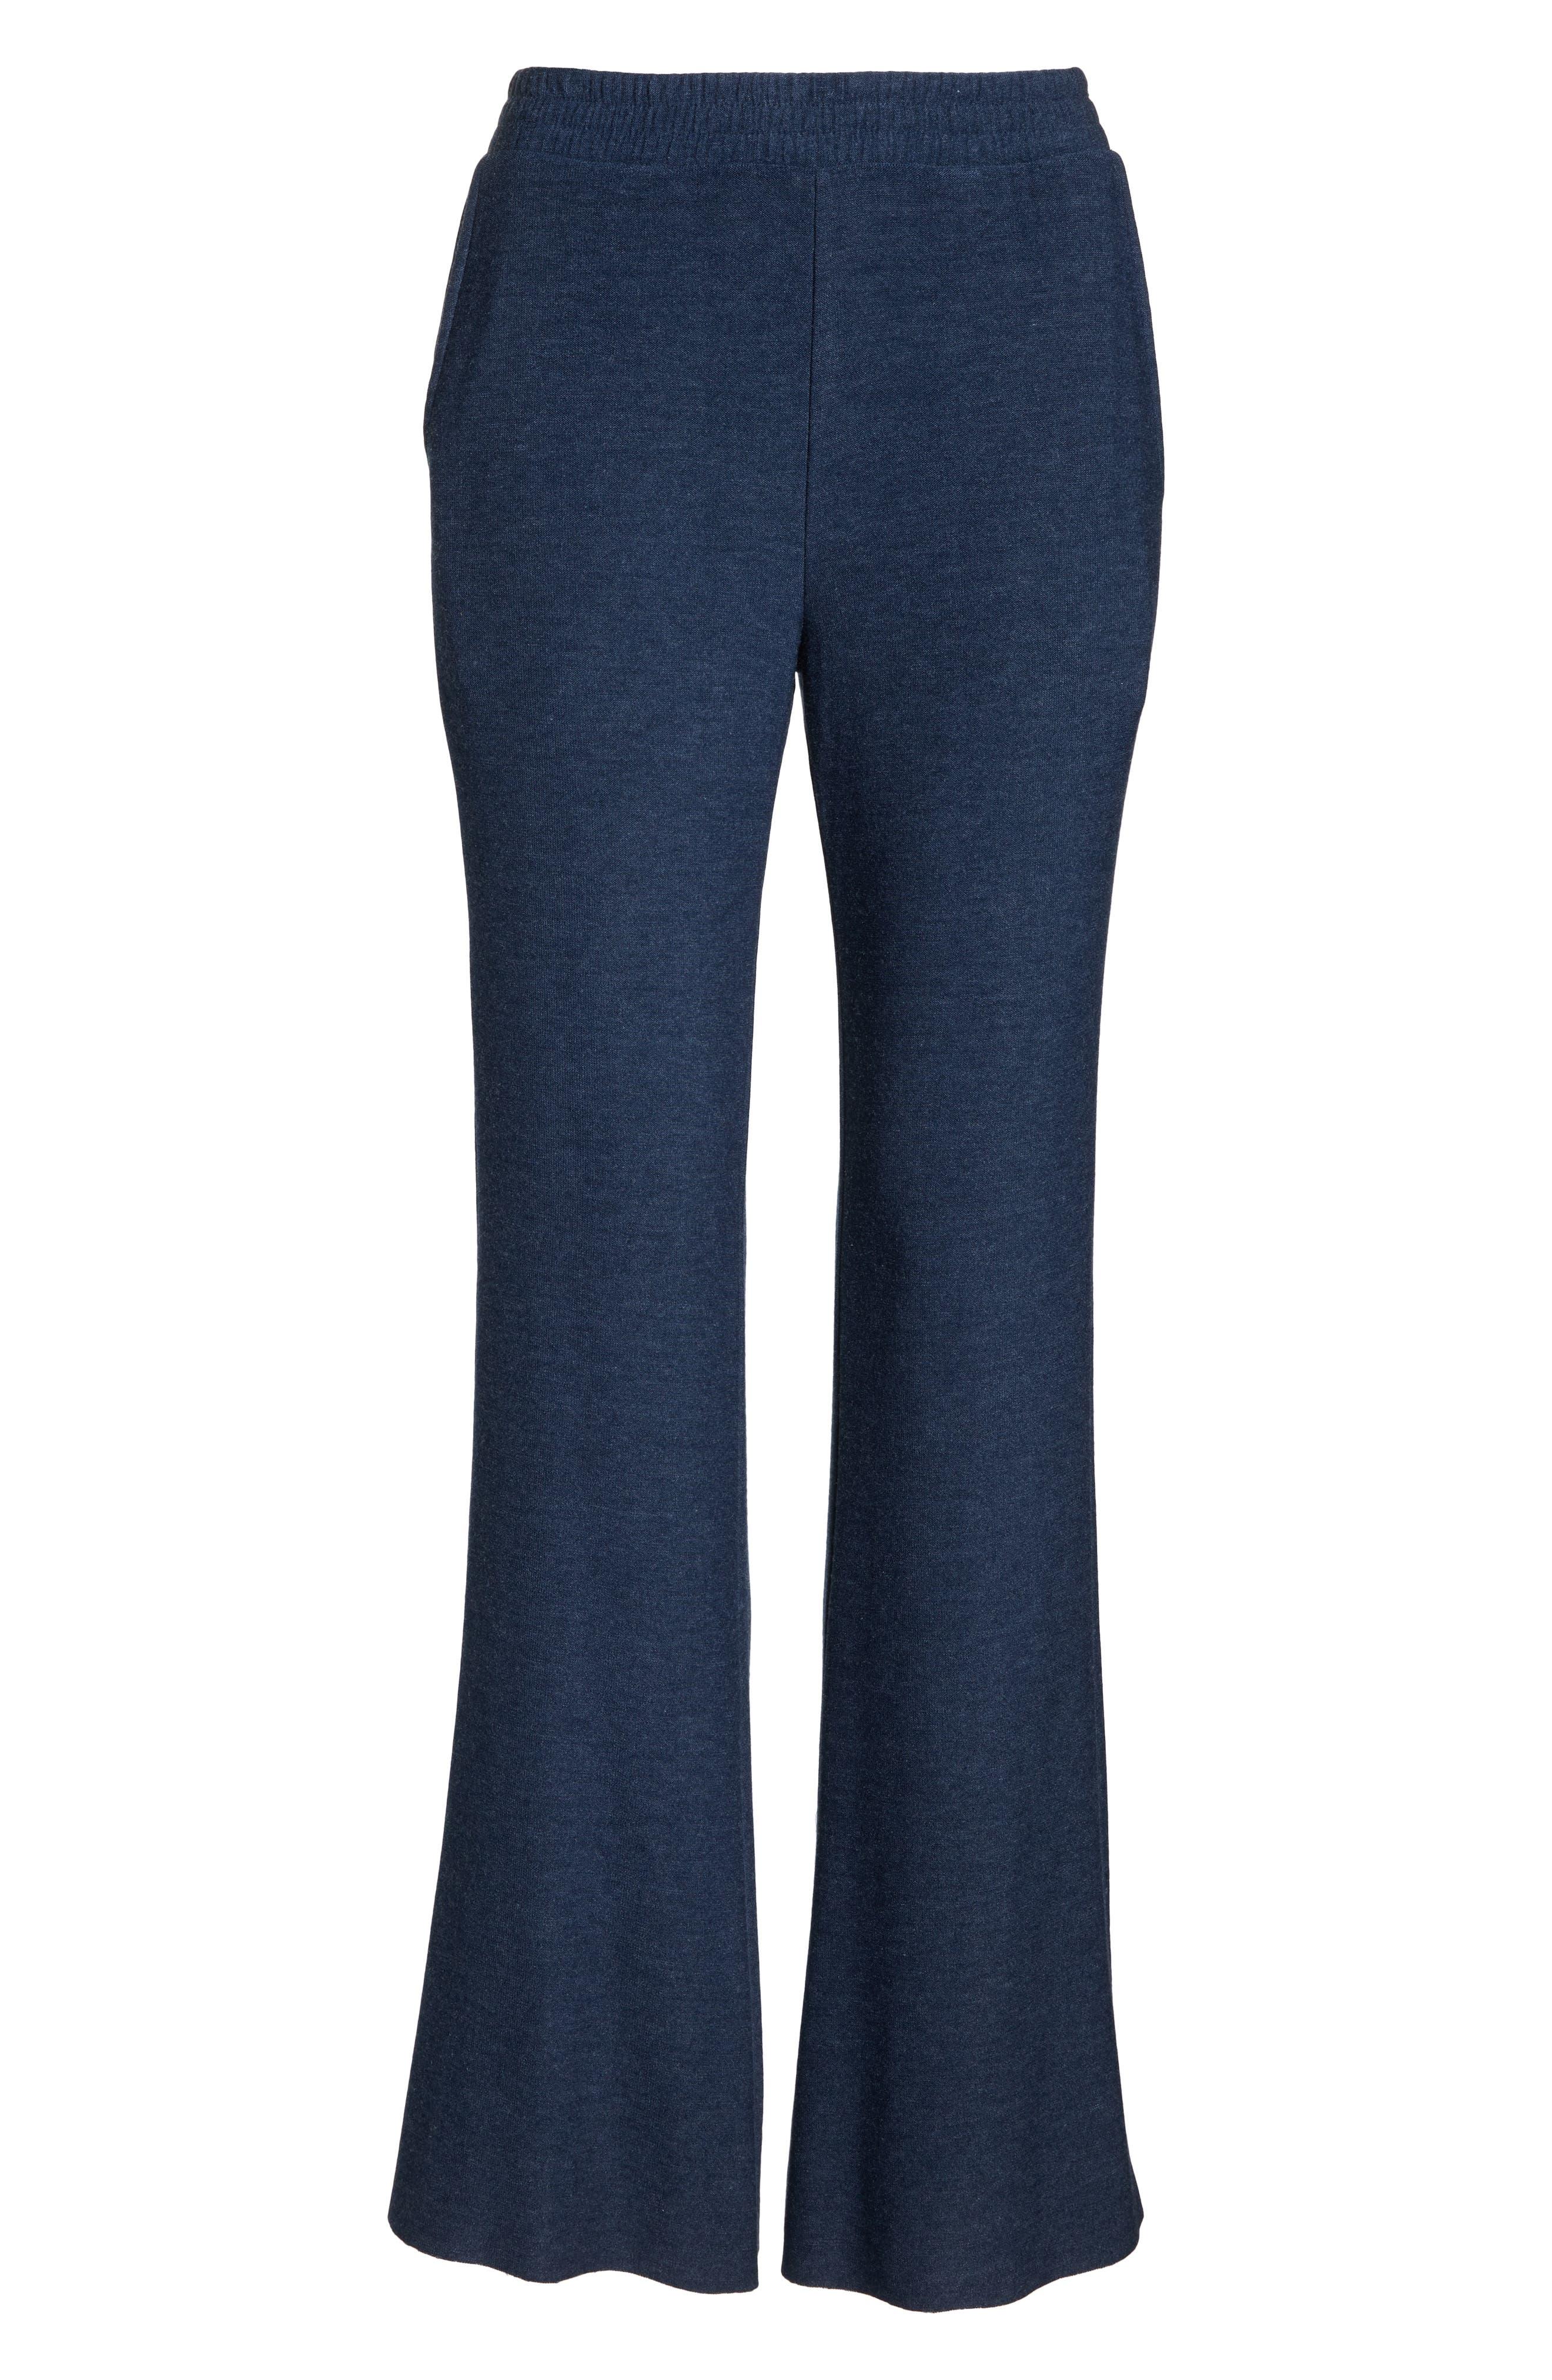 CHASER, Wide Leg Pajama Pants, Alternate thumbnail 7, color, 406